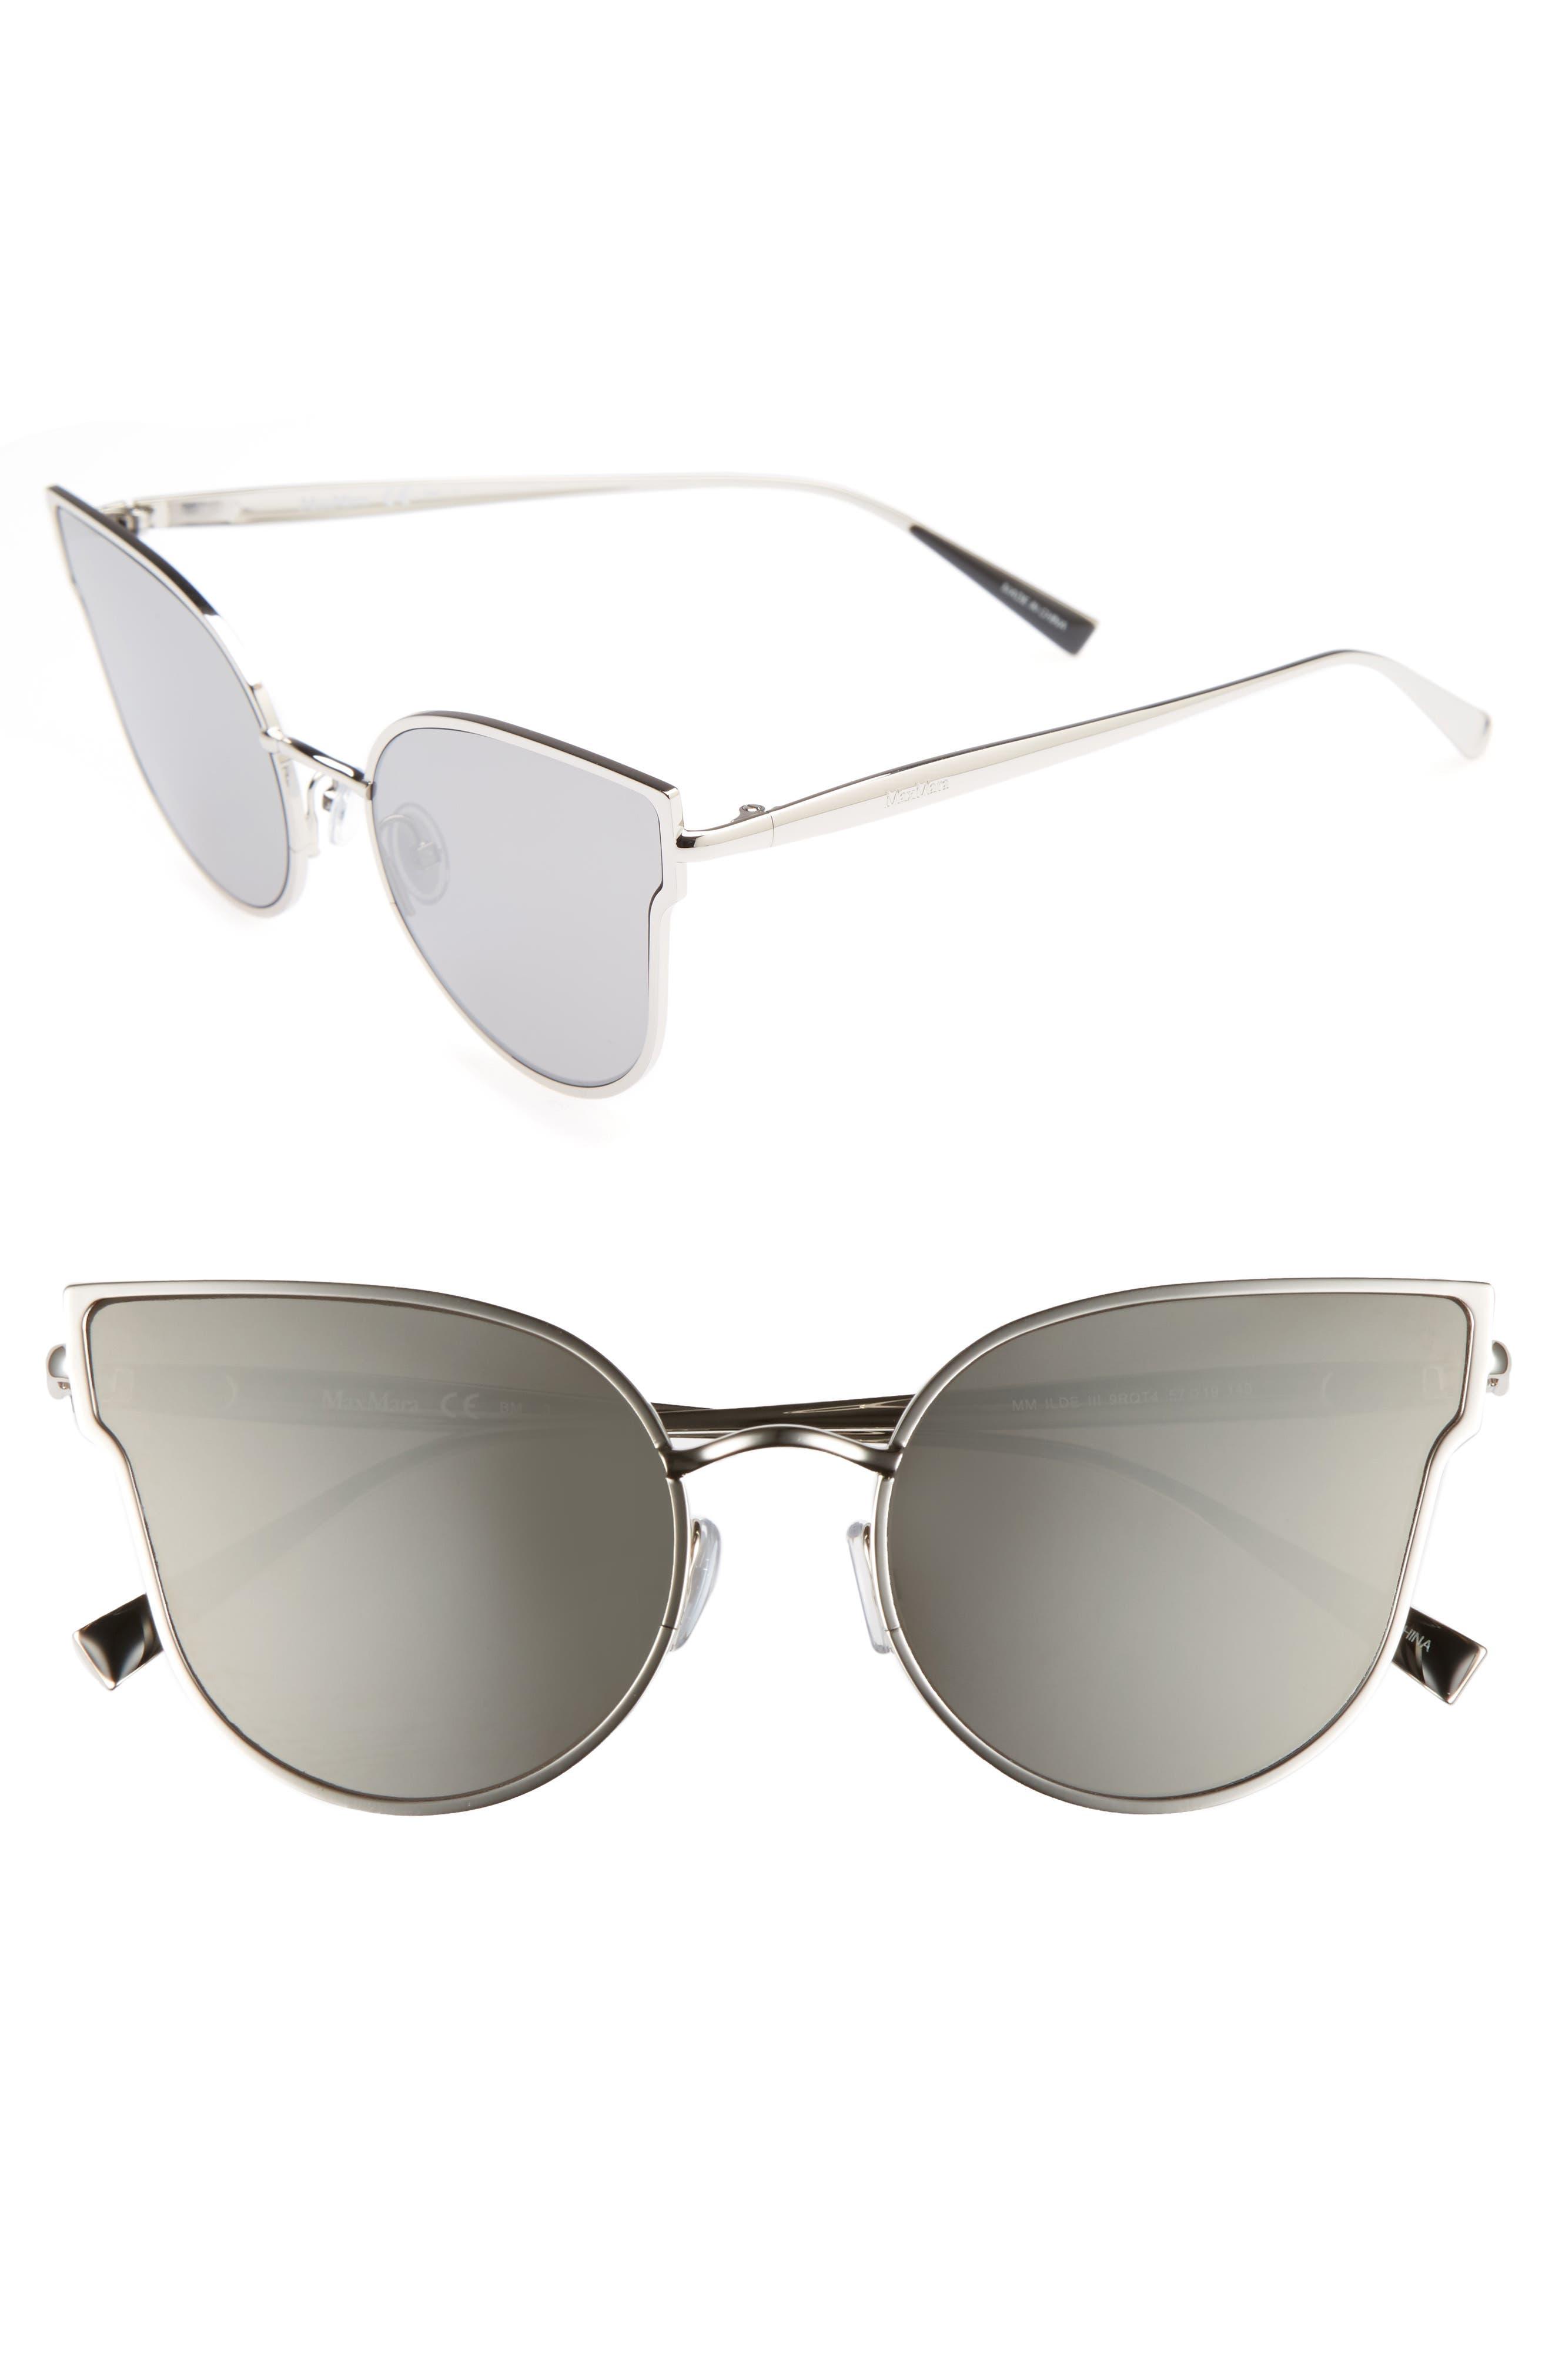 Ilde III 57mm Mirrored Cat Eye Sunglasses,                         Main,                         color, Smoke Silver